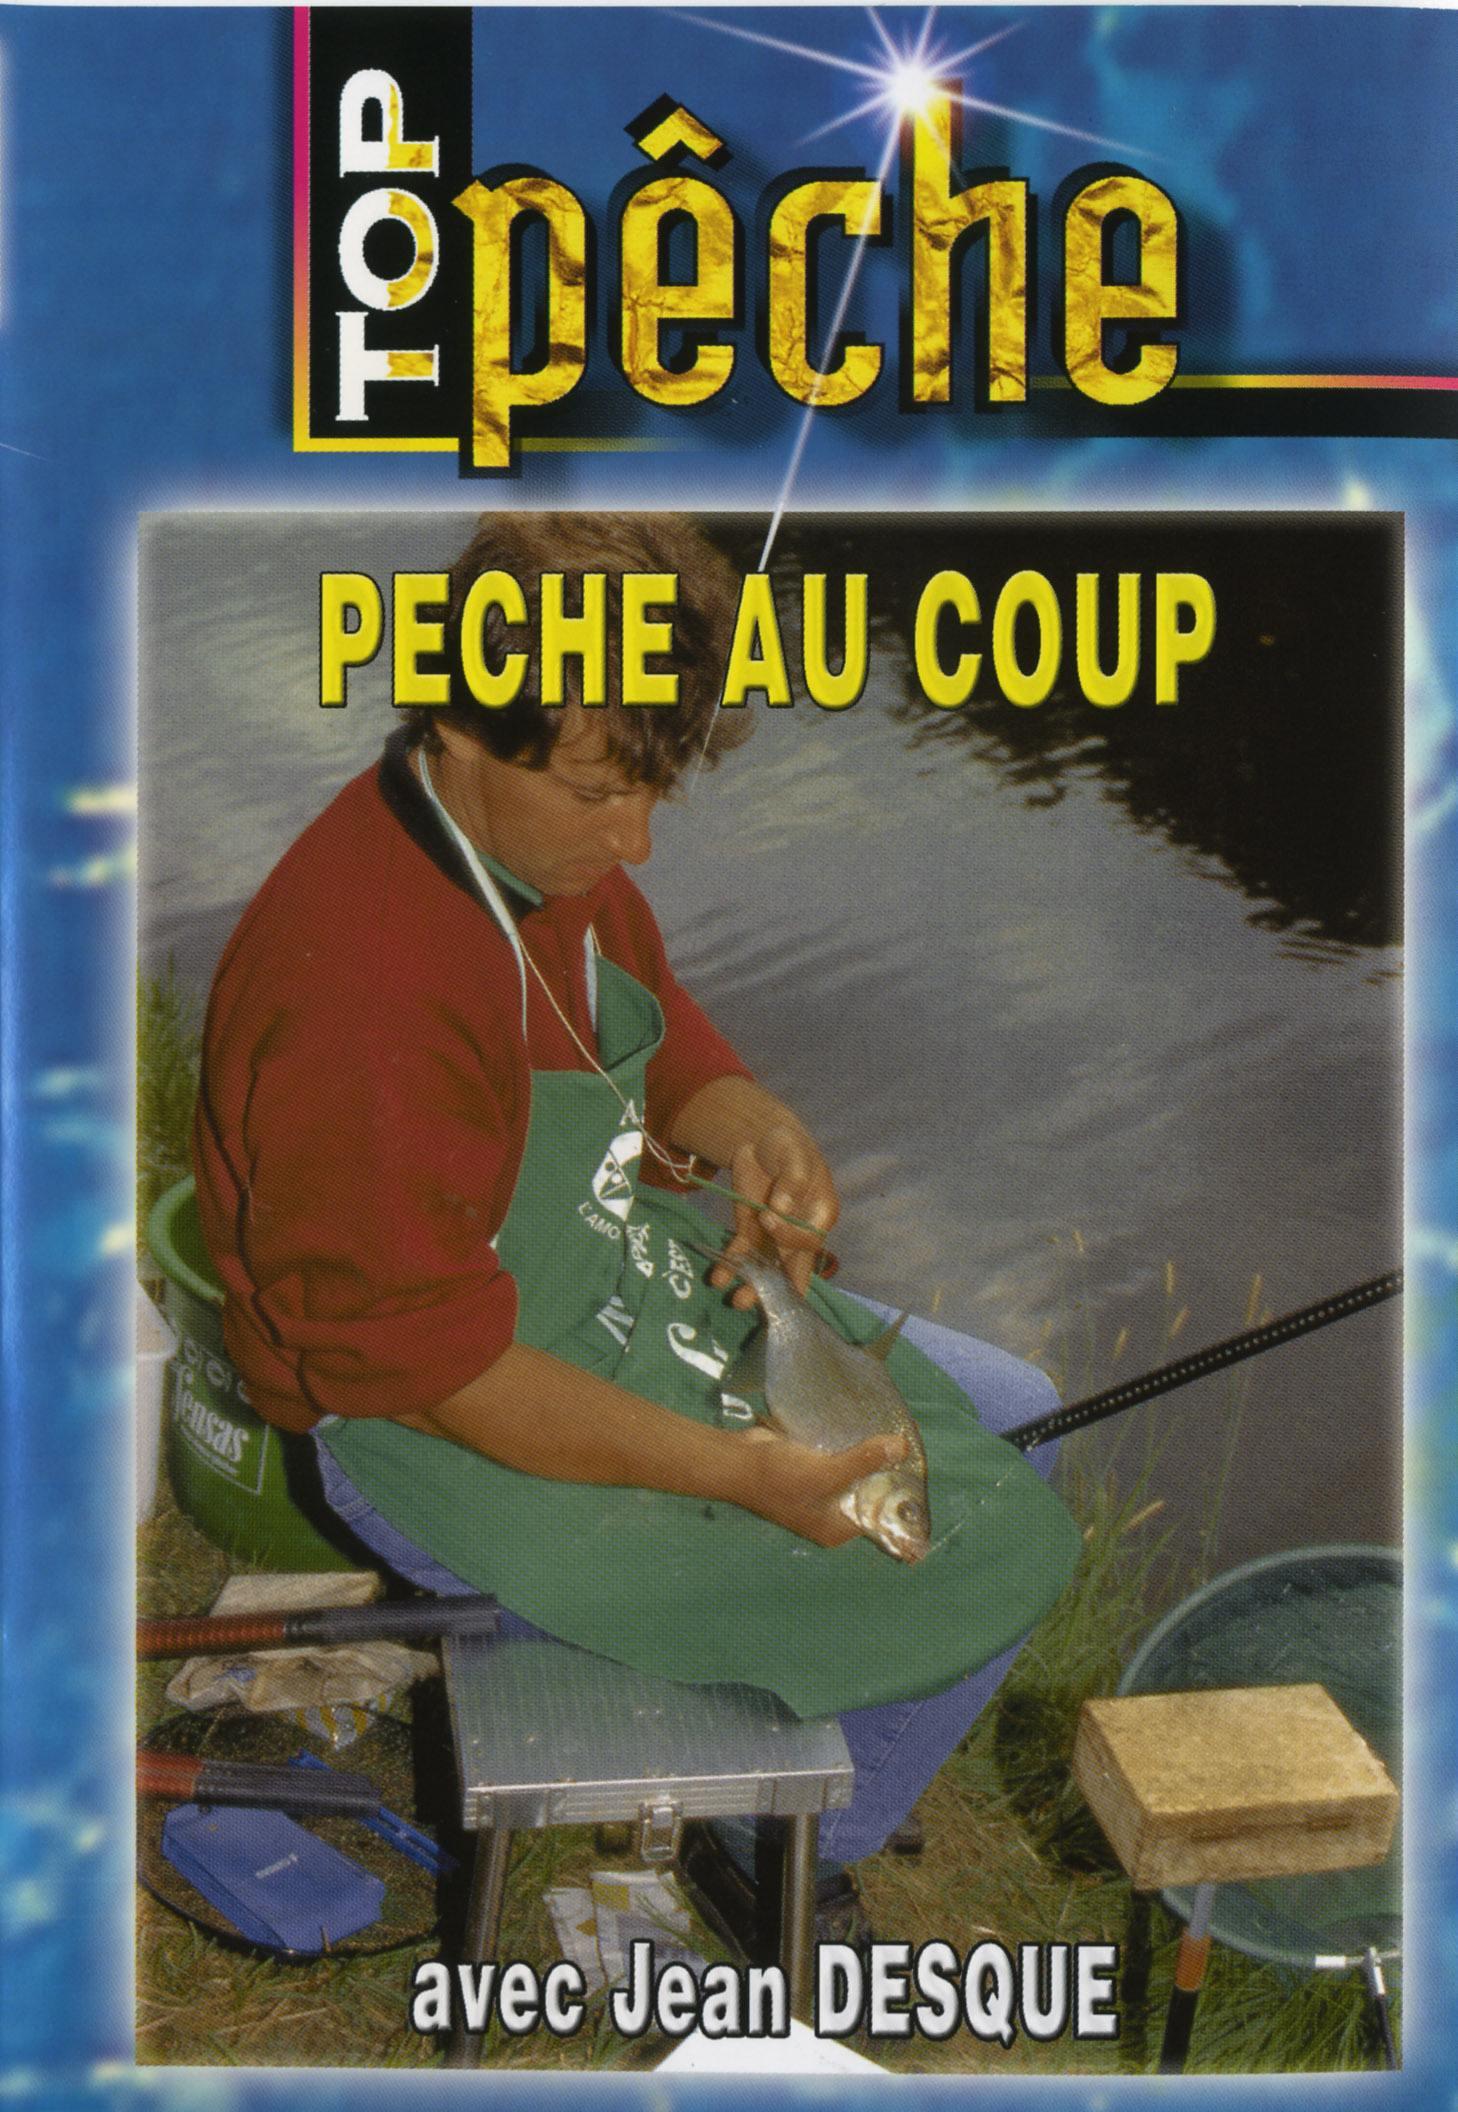 Top peche - peche au coup - dvd